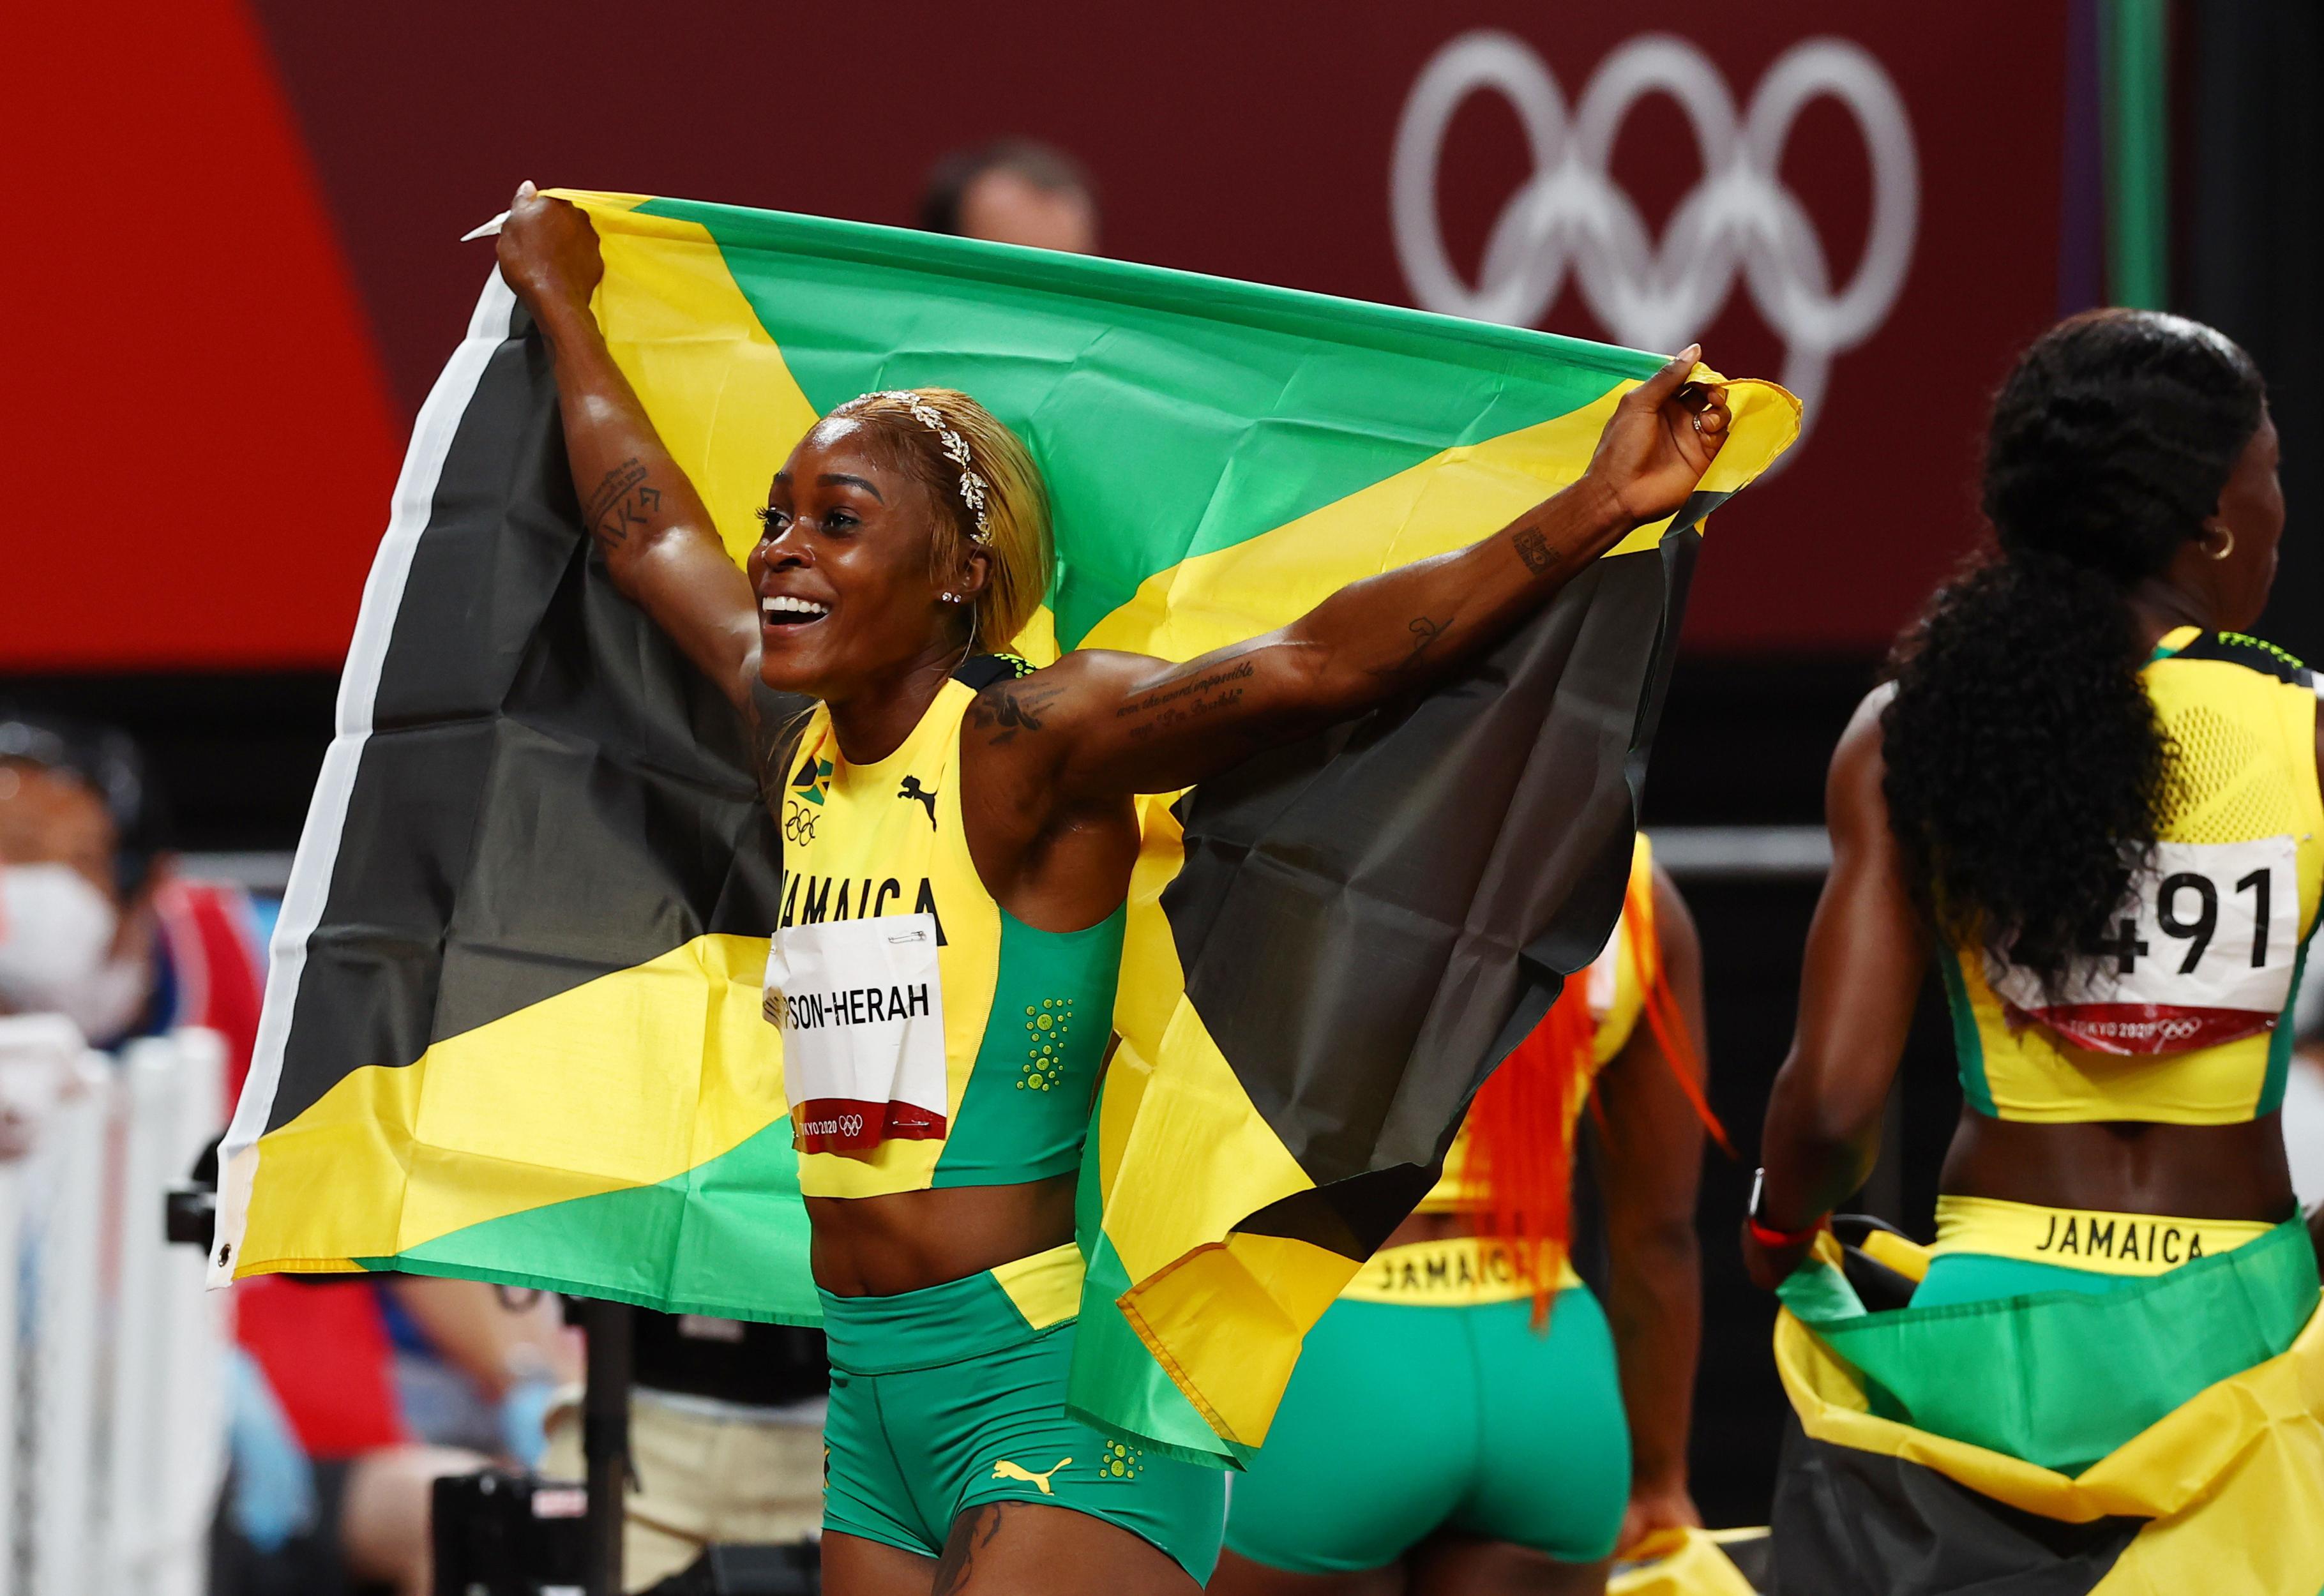 Tokyo 2020 Olympics - Athletics - Women's 100m - Final - OLS - Olympic Stadium, Tokyo, Japan - July 31, 2021. Elaine Thompson-Herah of Jamaica celebrates winning the gold medal REUTERS/Kai Pfaffenbach